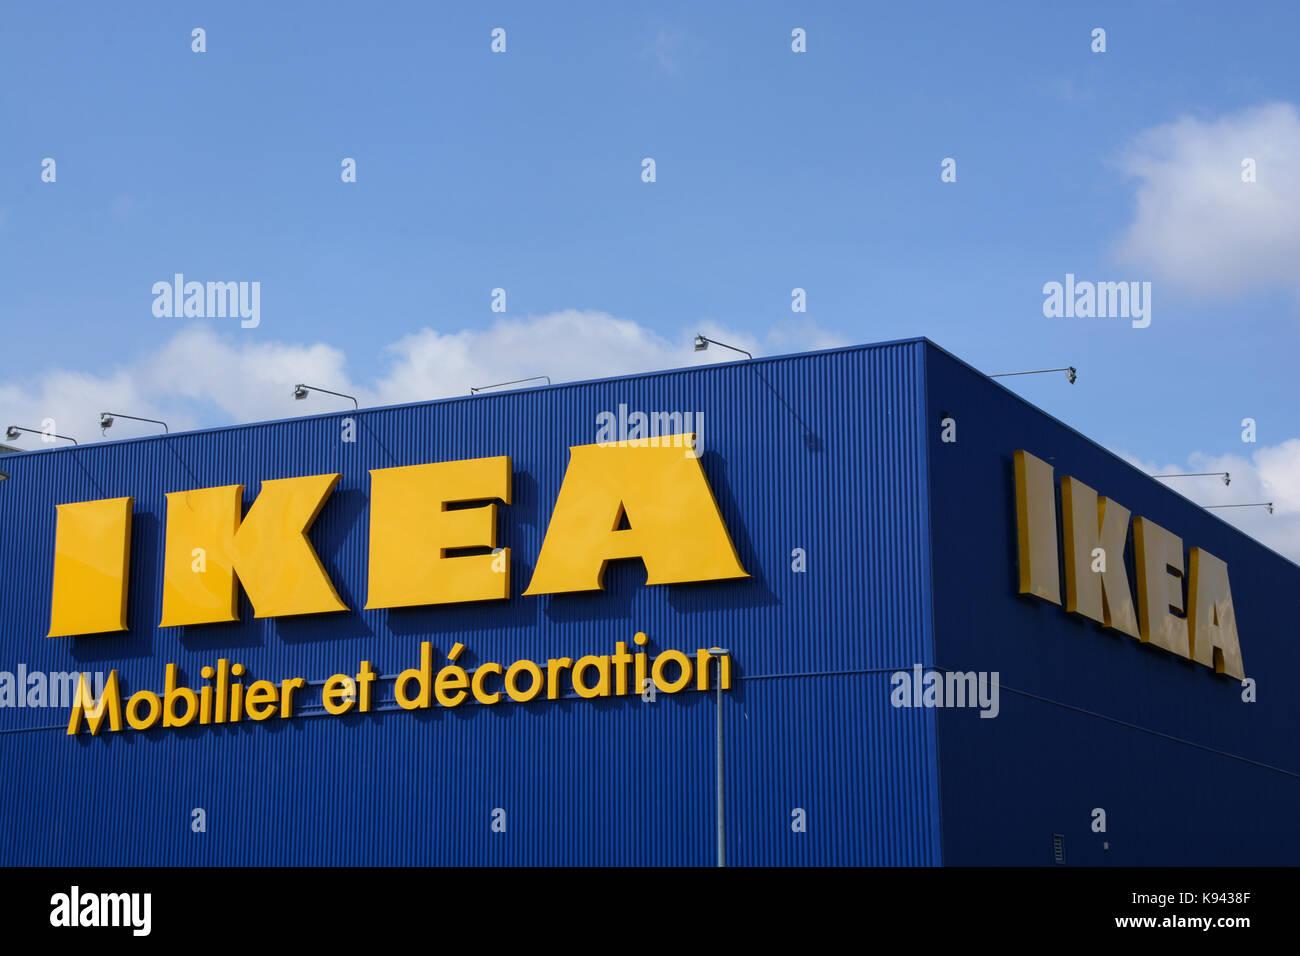 Ikea store exterior stock photos ikea store exterior for Ikea stehhocker